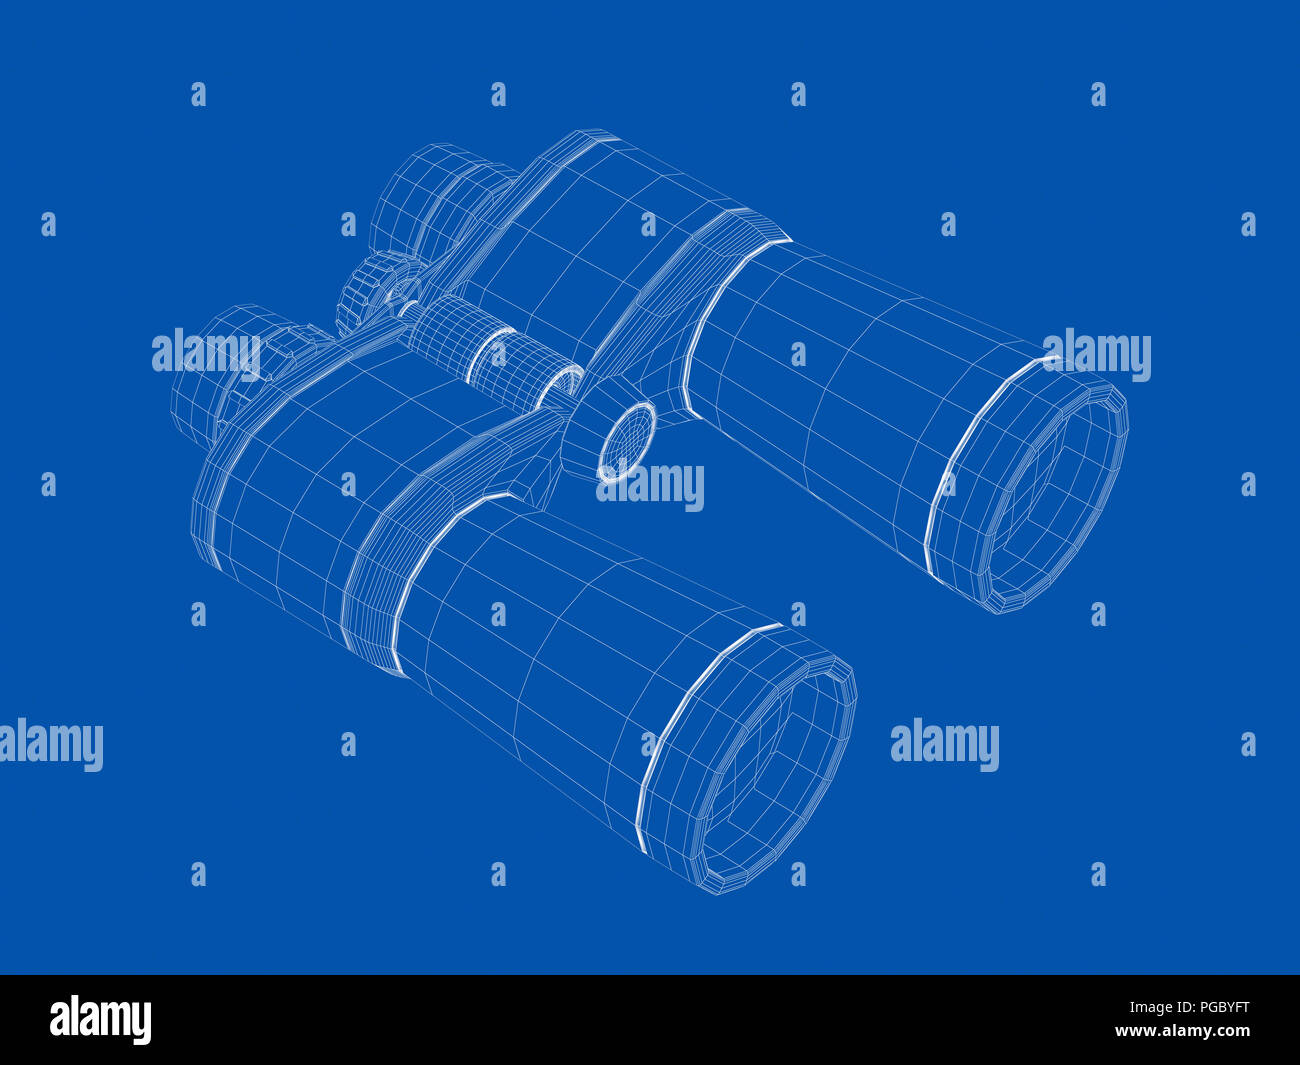 Wire Frame Gles Stockfotos & Wire Frame Gles Bilder - Alamy on